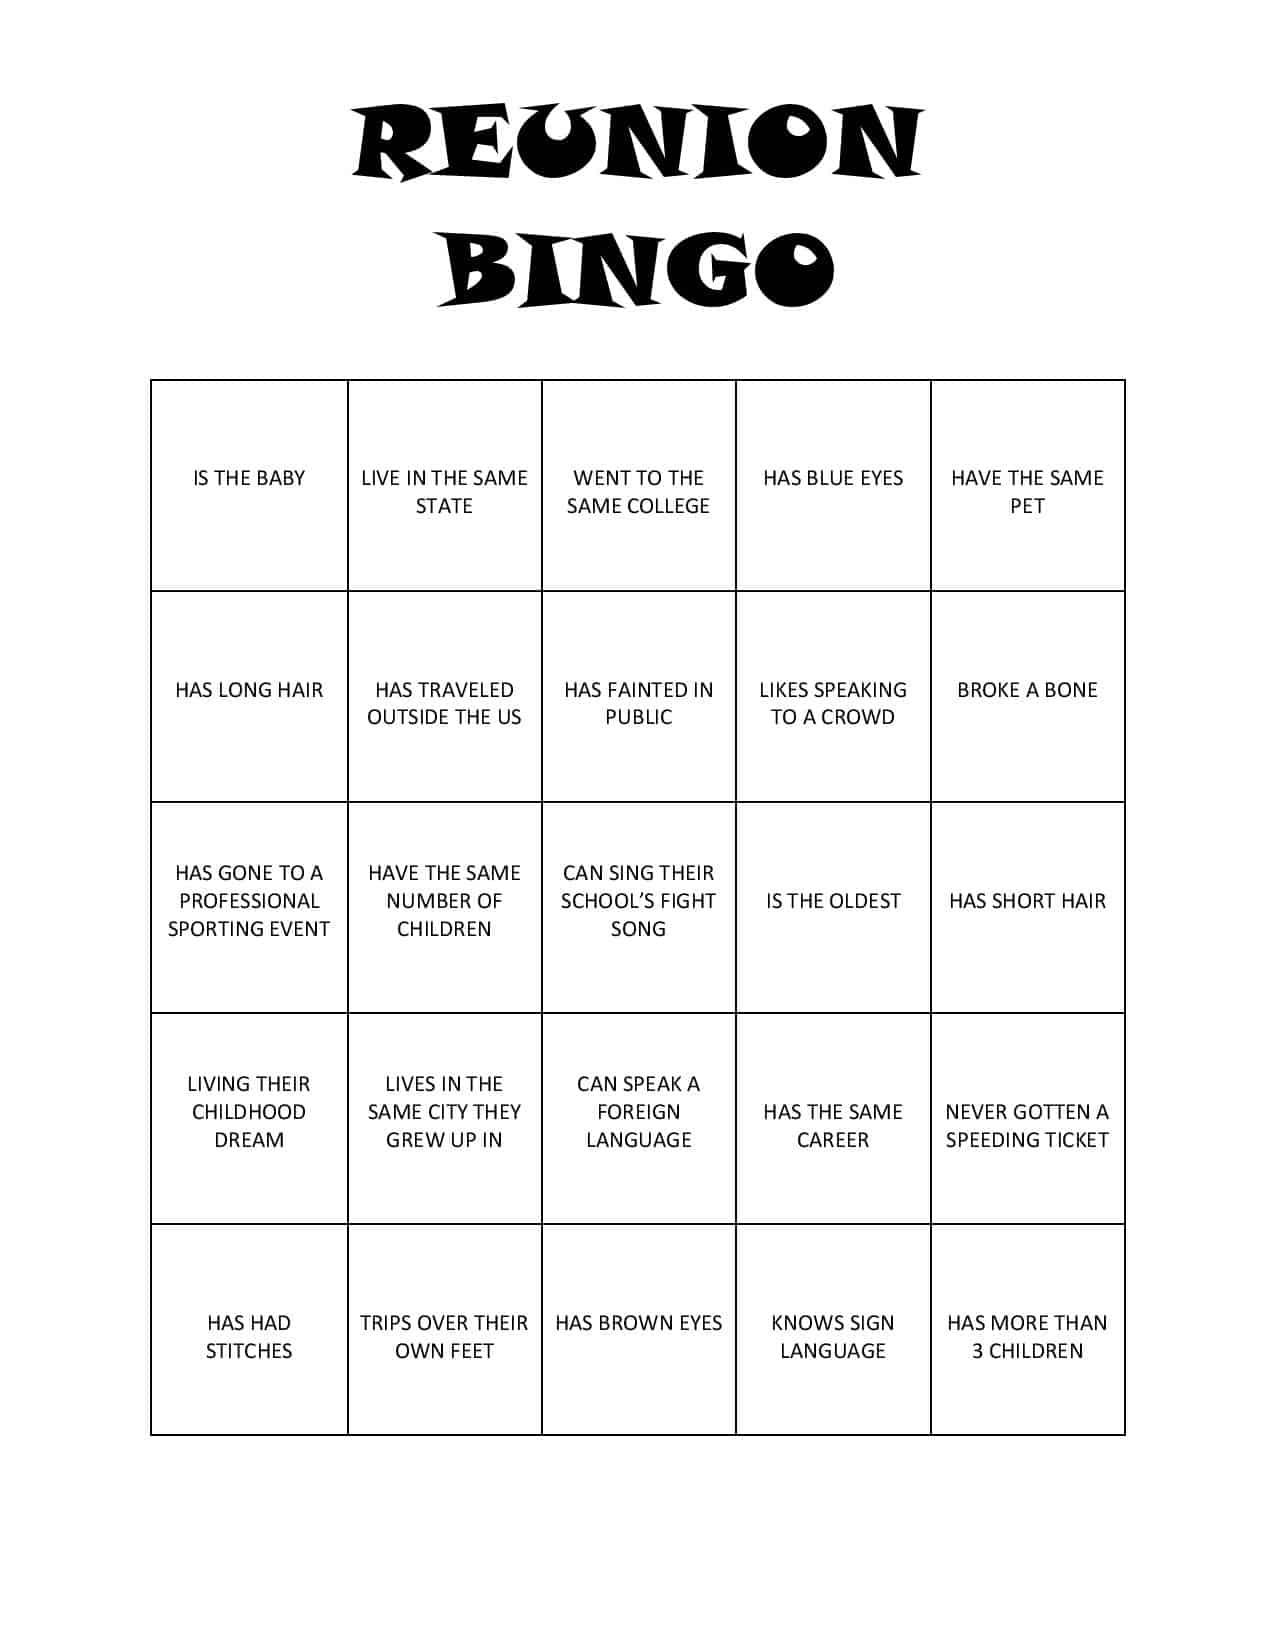 Reunion Bingo Free Printable